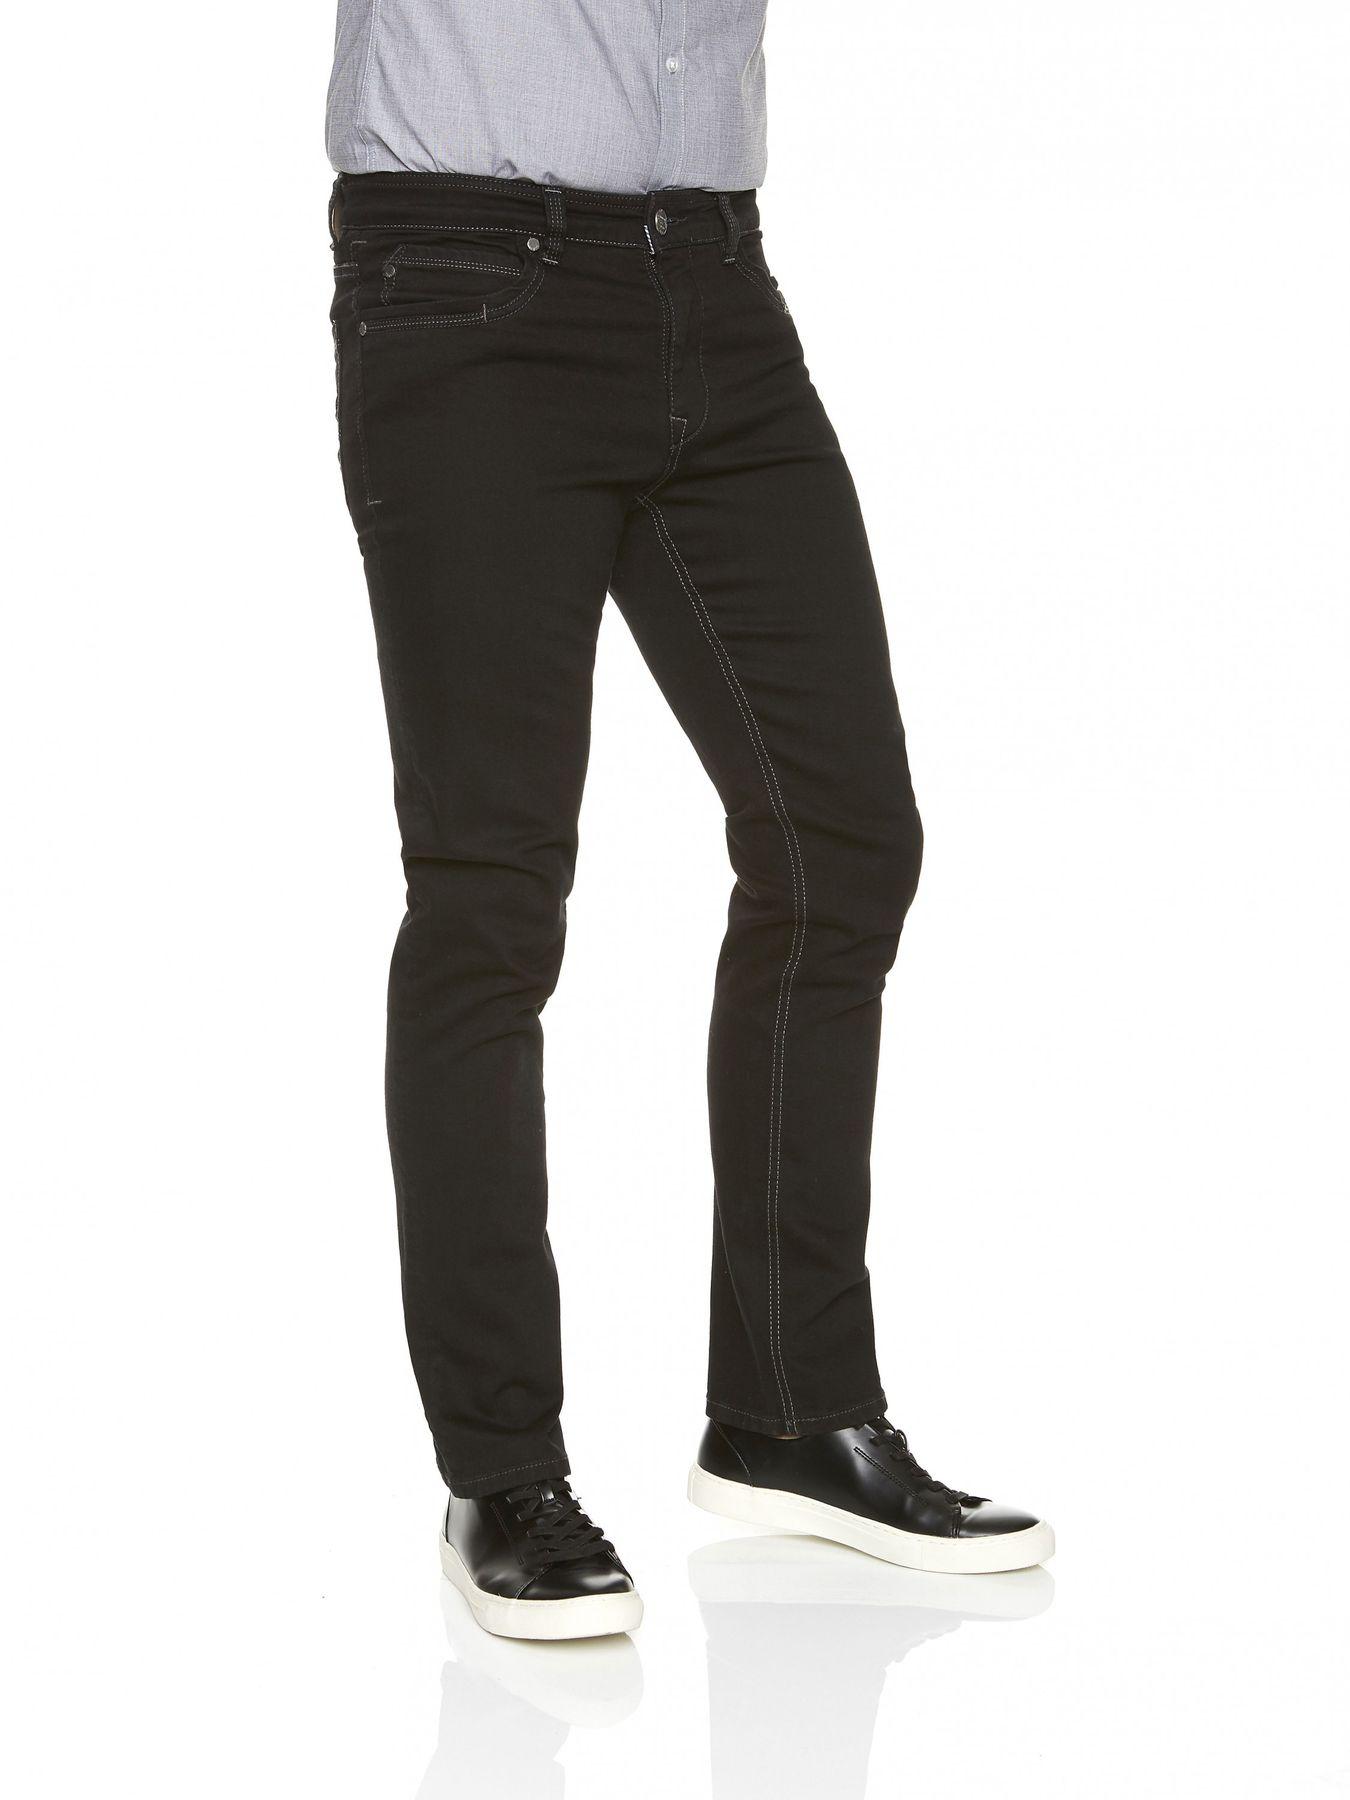 Atelier Gardeur - Herren 5-Pocket Jeans Superflex, Farben black(99), dark stone(68), stone blue(67), anthrazit(198) BATU (71001) – Bild 10